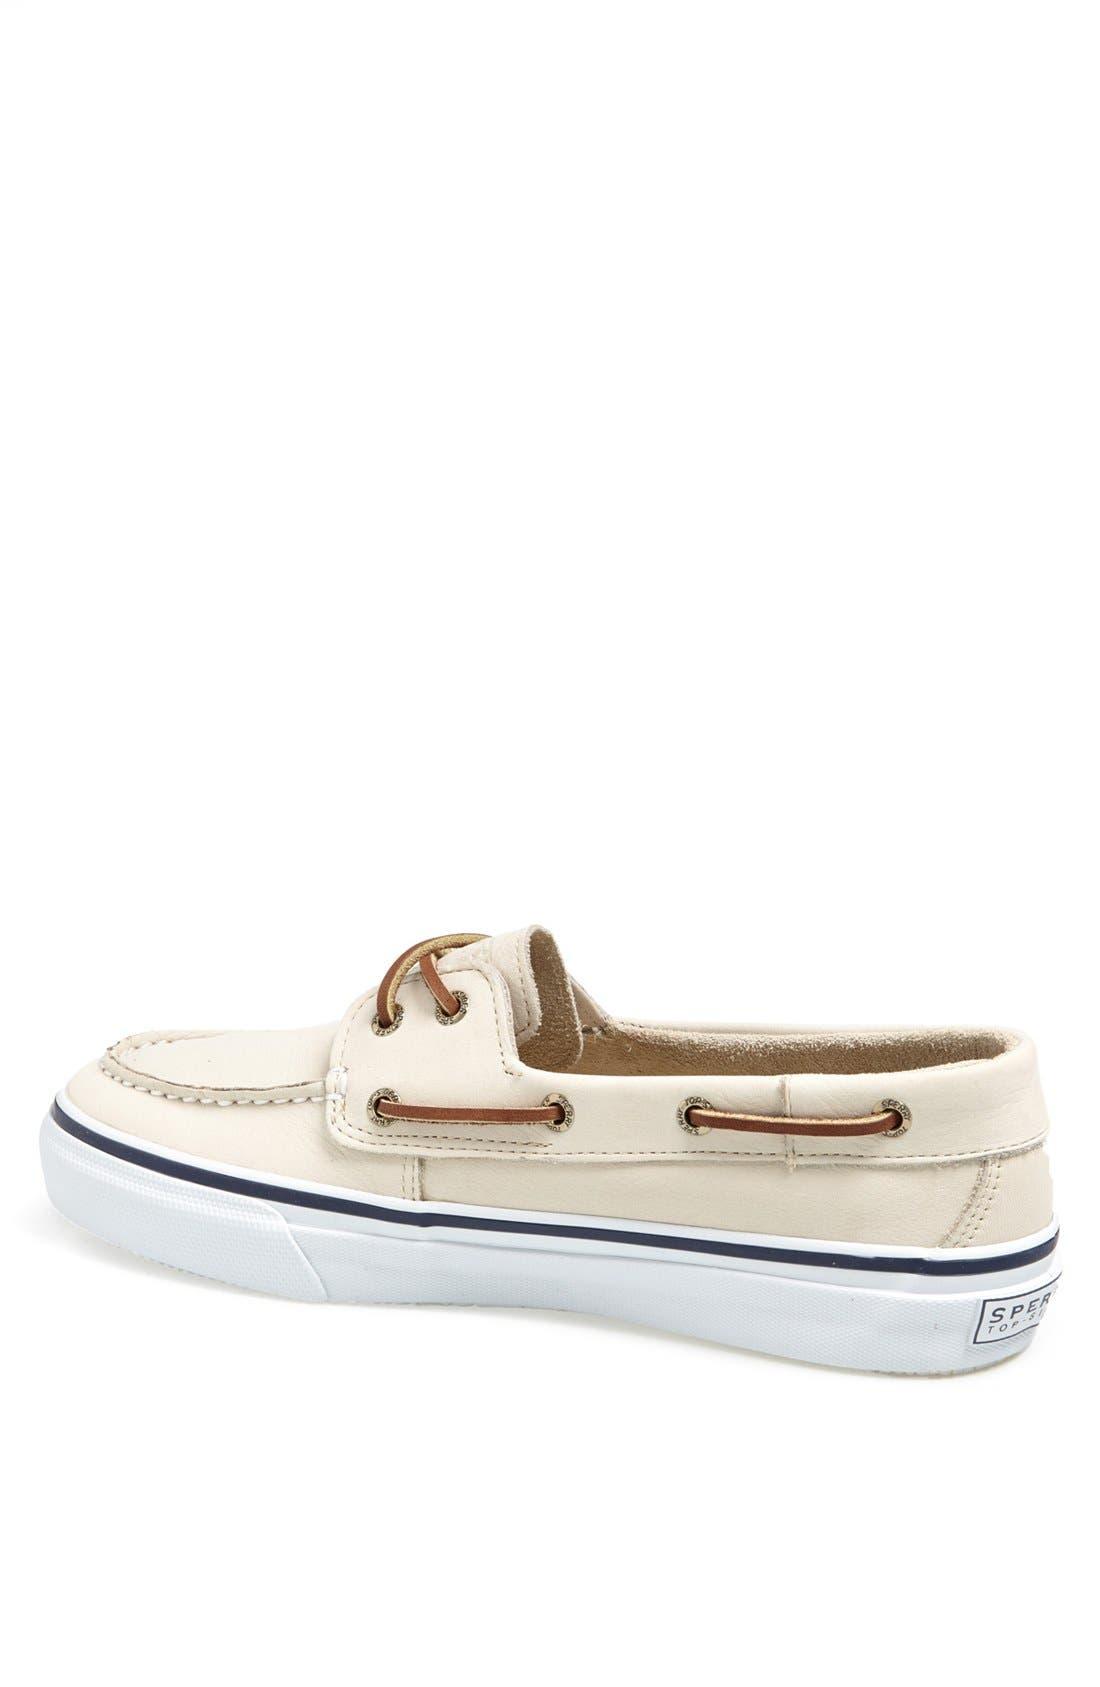 Alternate Image 2  - Sperry Top-Sider® 'Bahama' Washable Boat Shoe